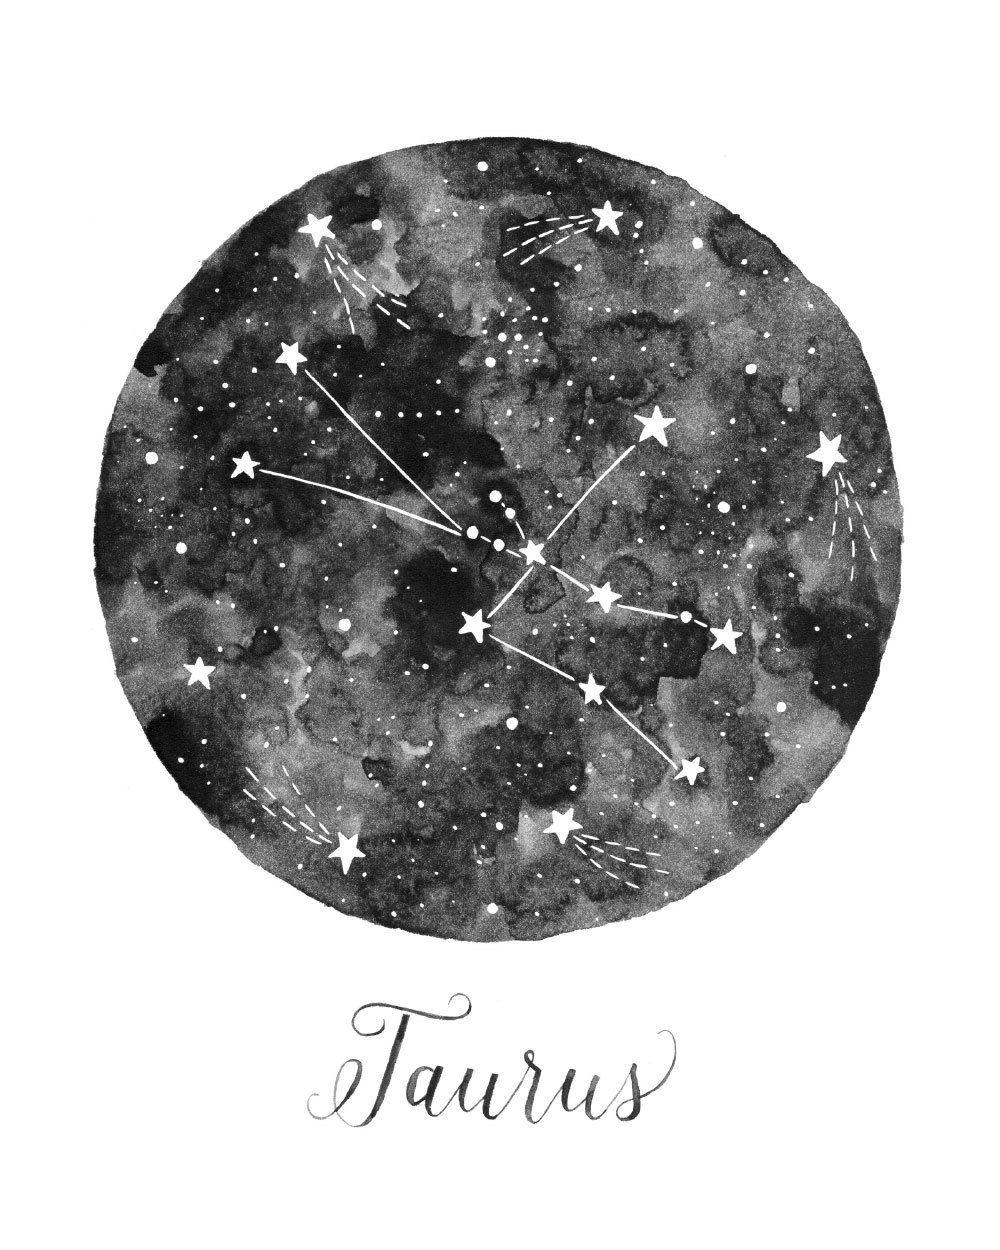 Taurus Wallpaper: Taurus Constellation Illustration Vertical By Fercute On